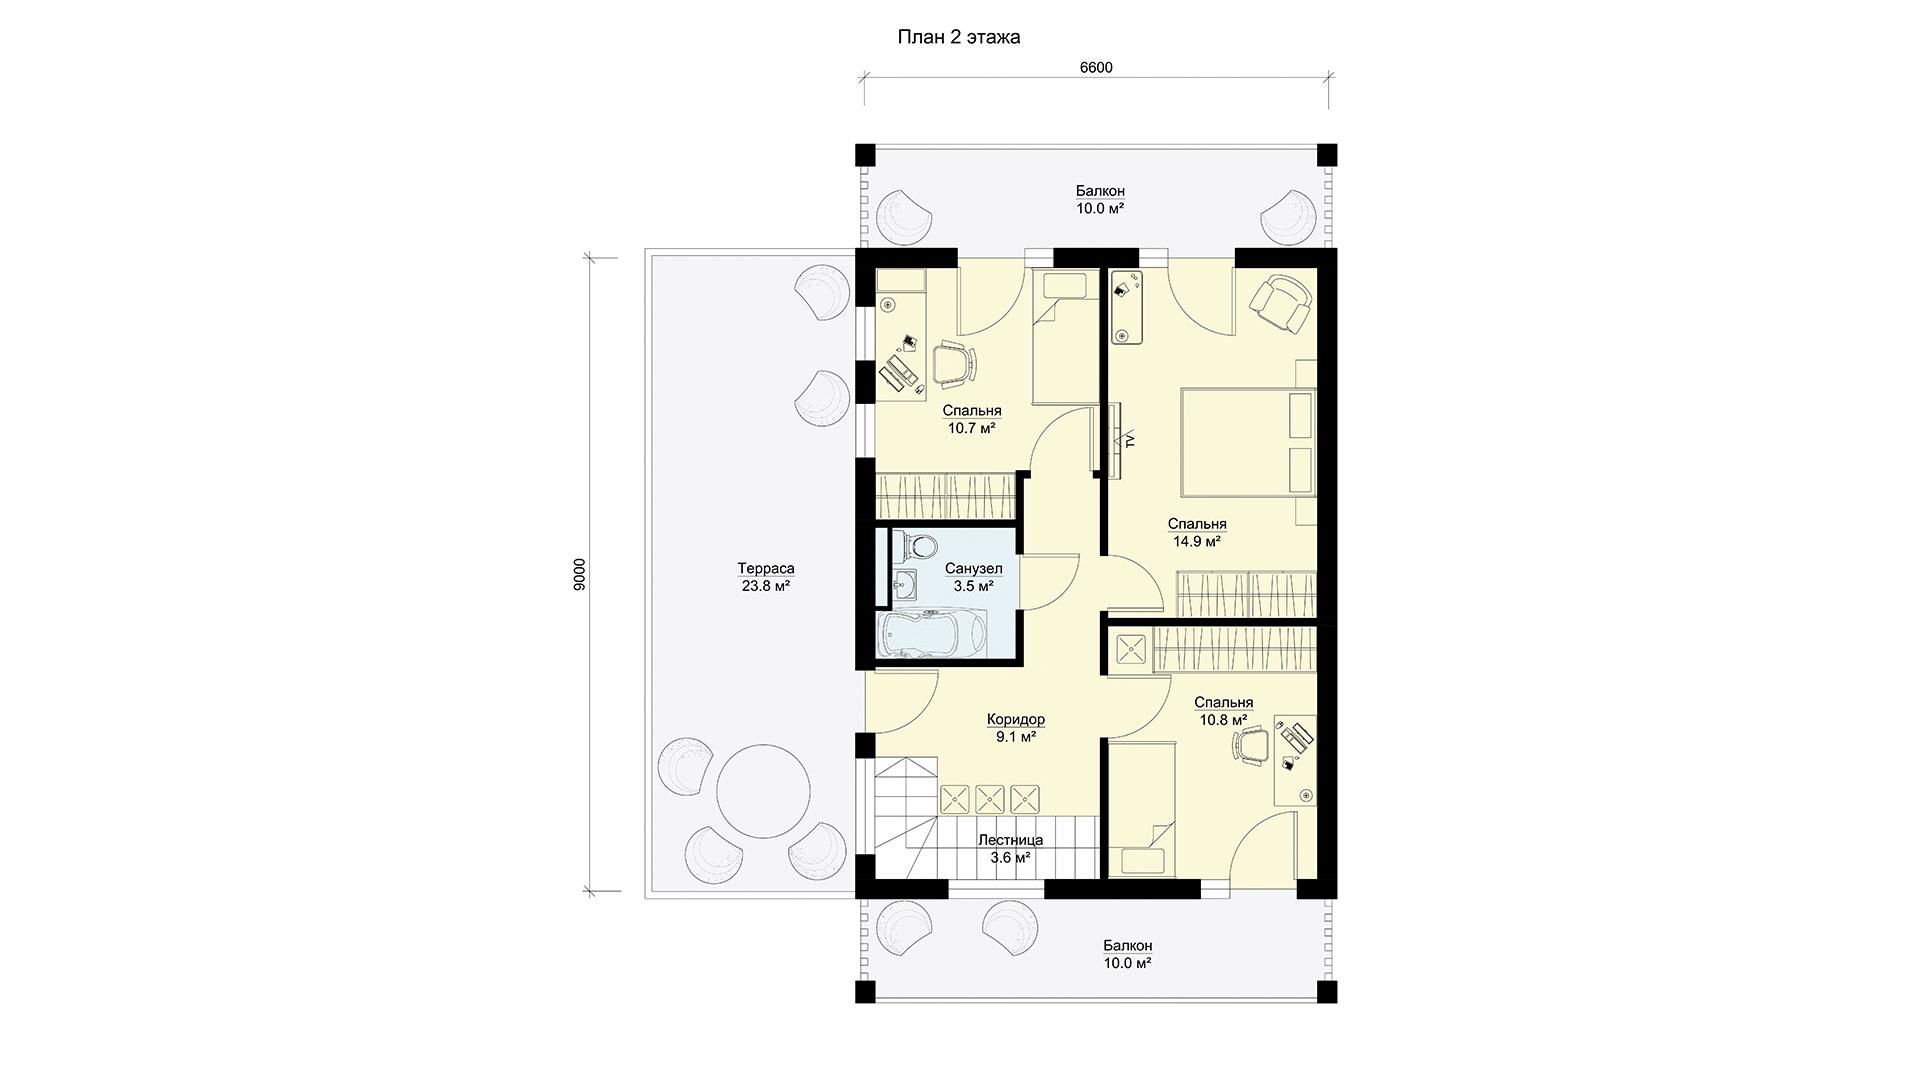 План второго этажа двухэтажного дома БЭНПАН, проект МС-195.